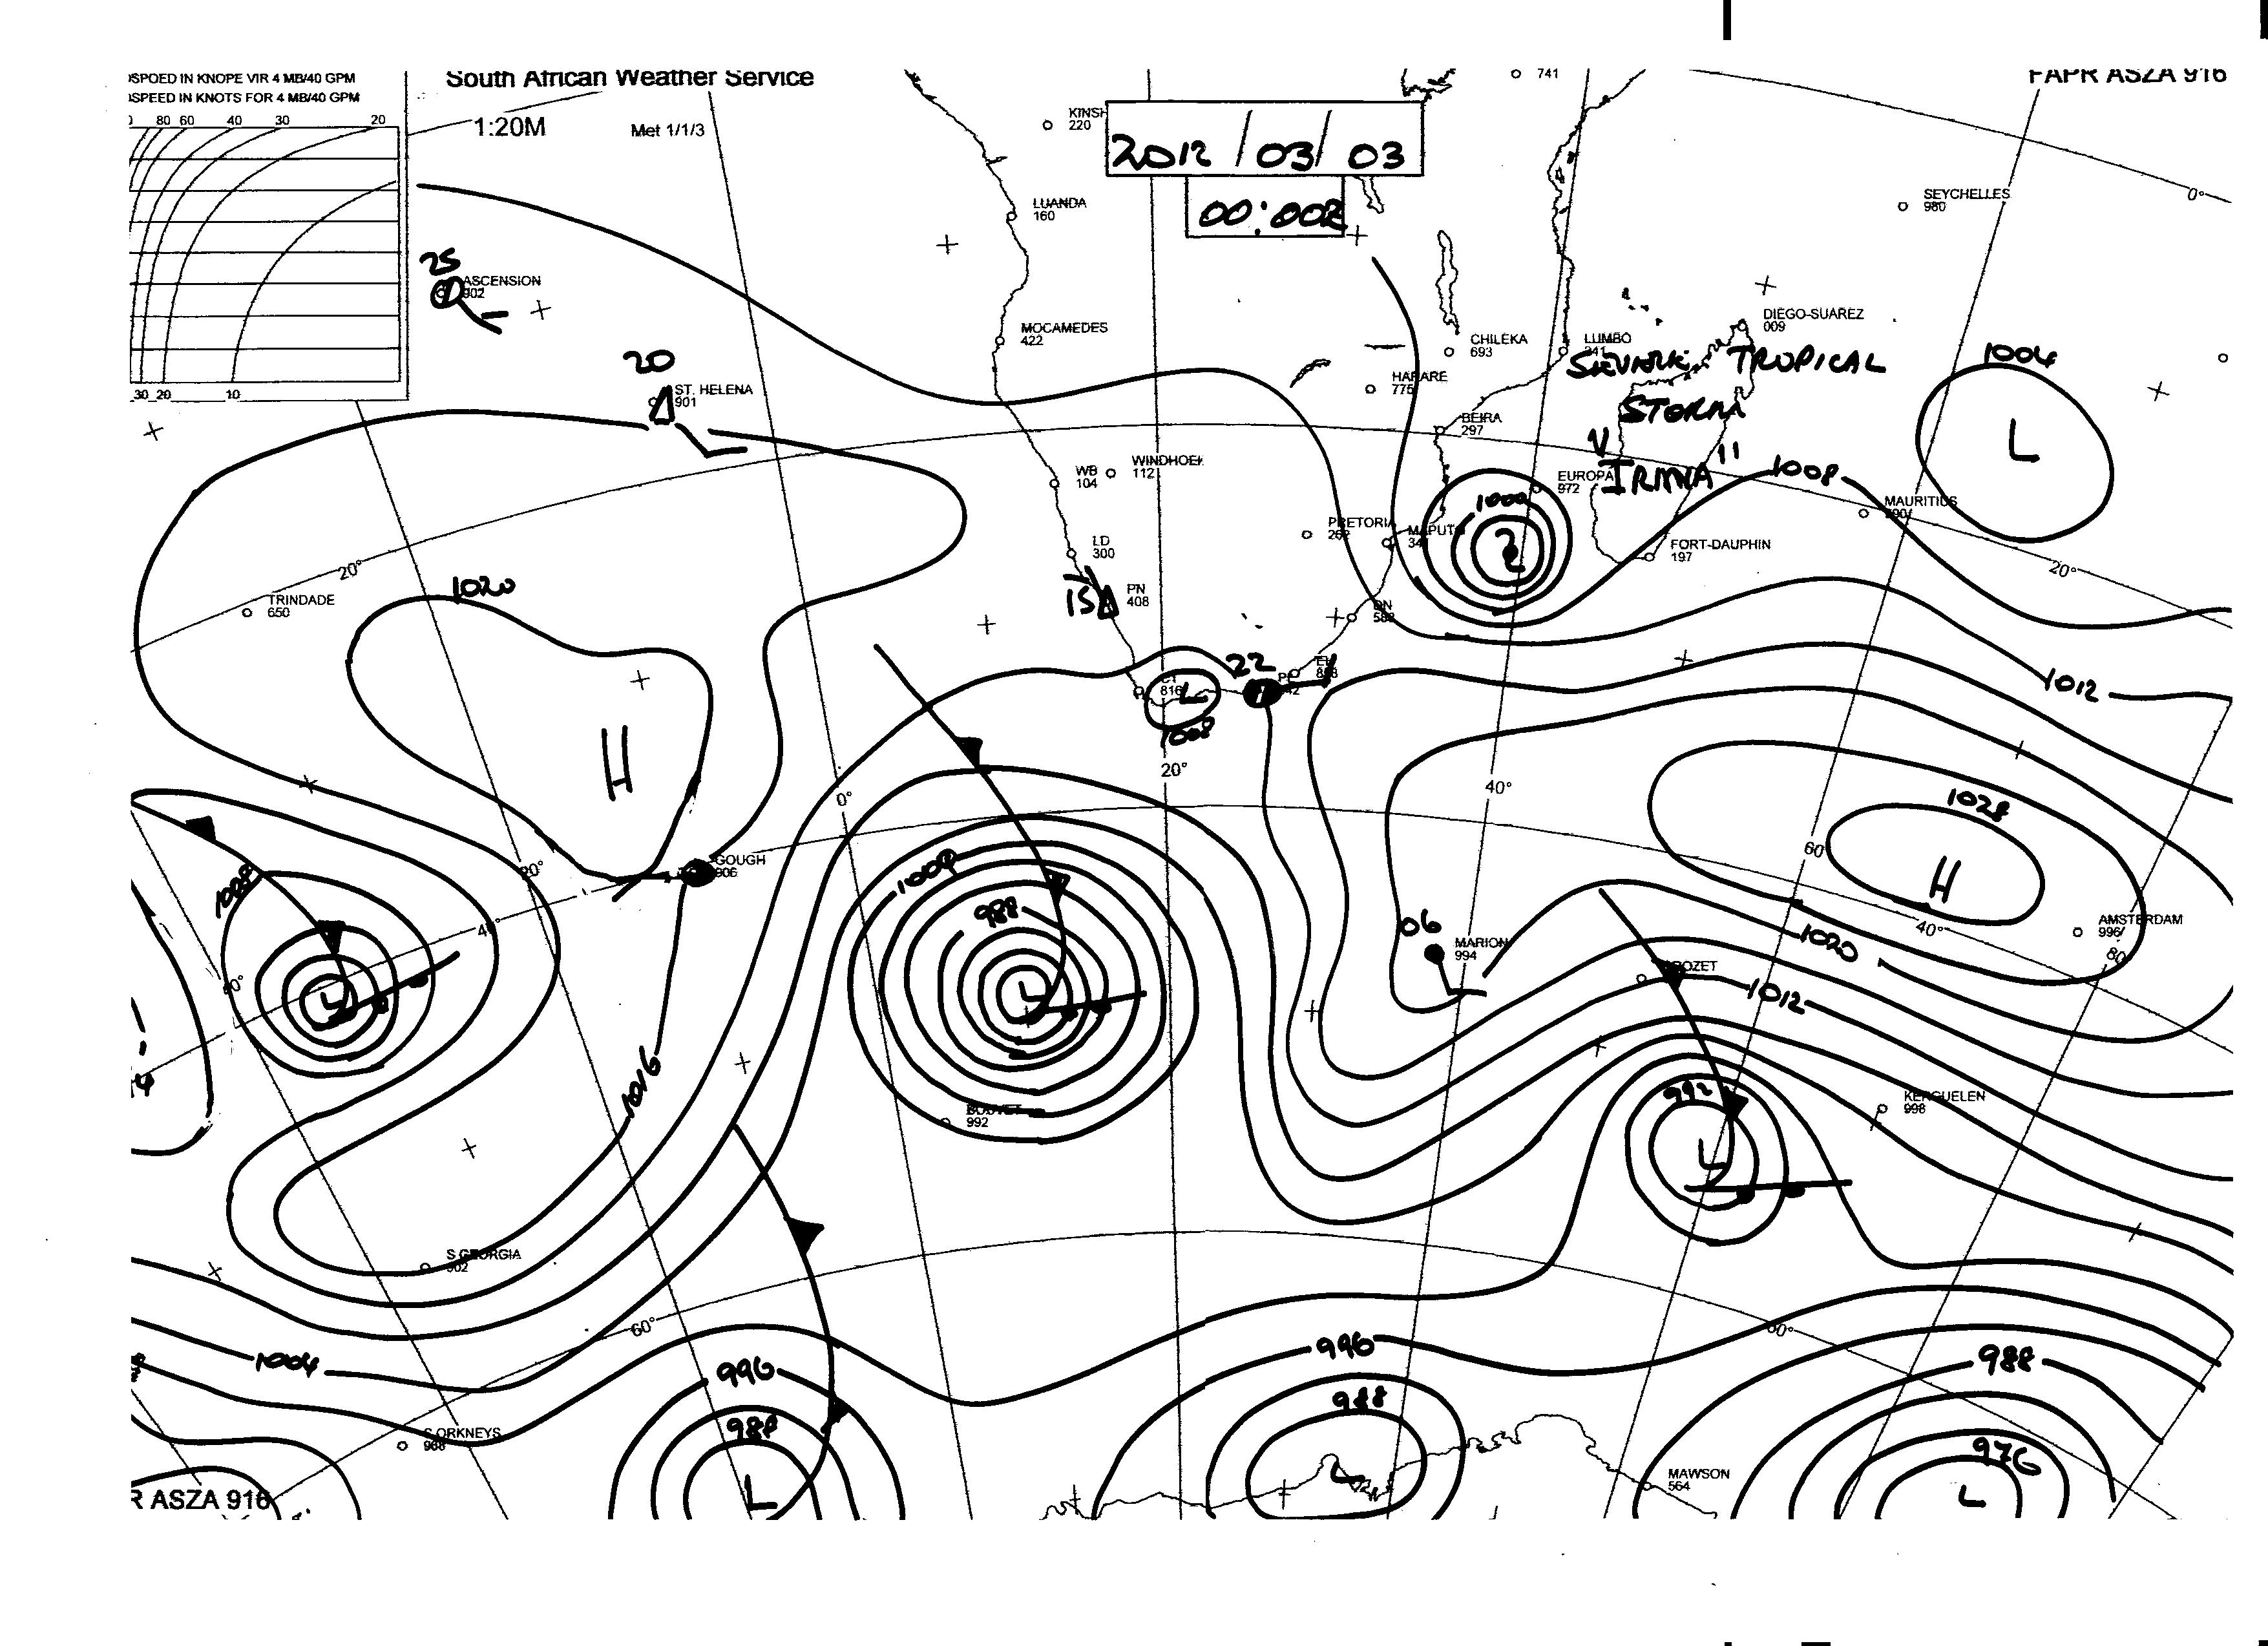 south african synoptic chart | Jeffreys Bay News